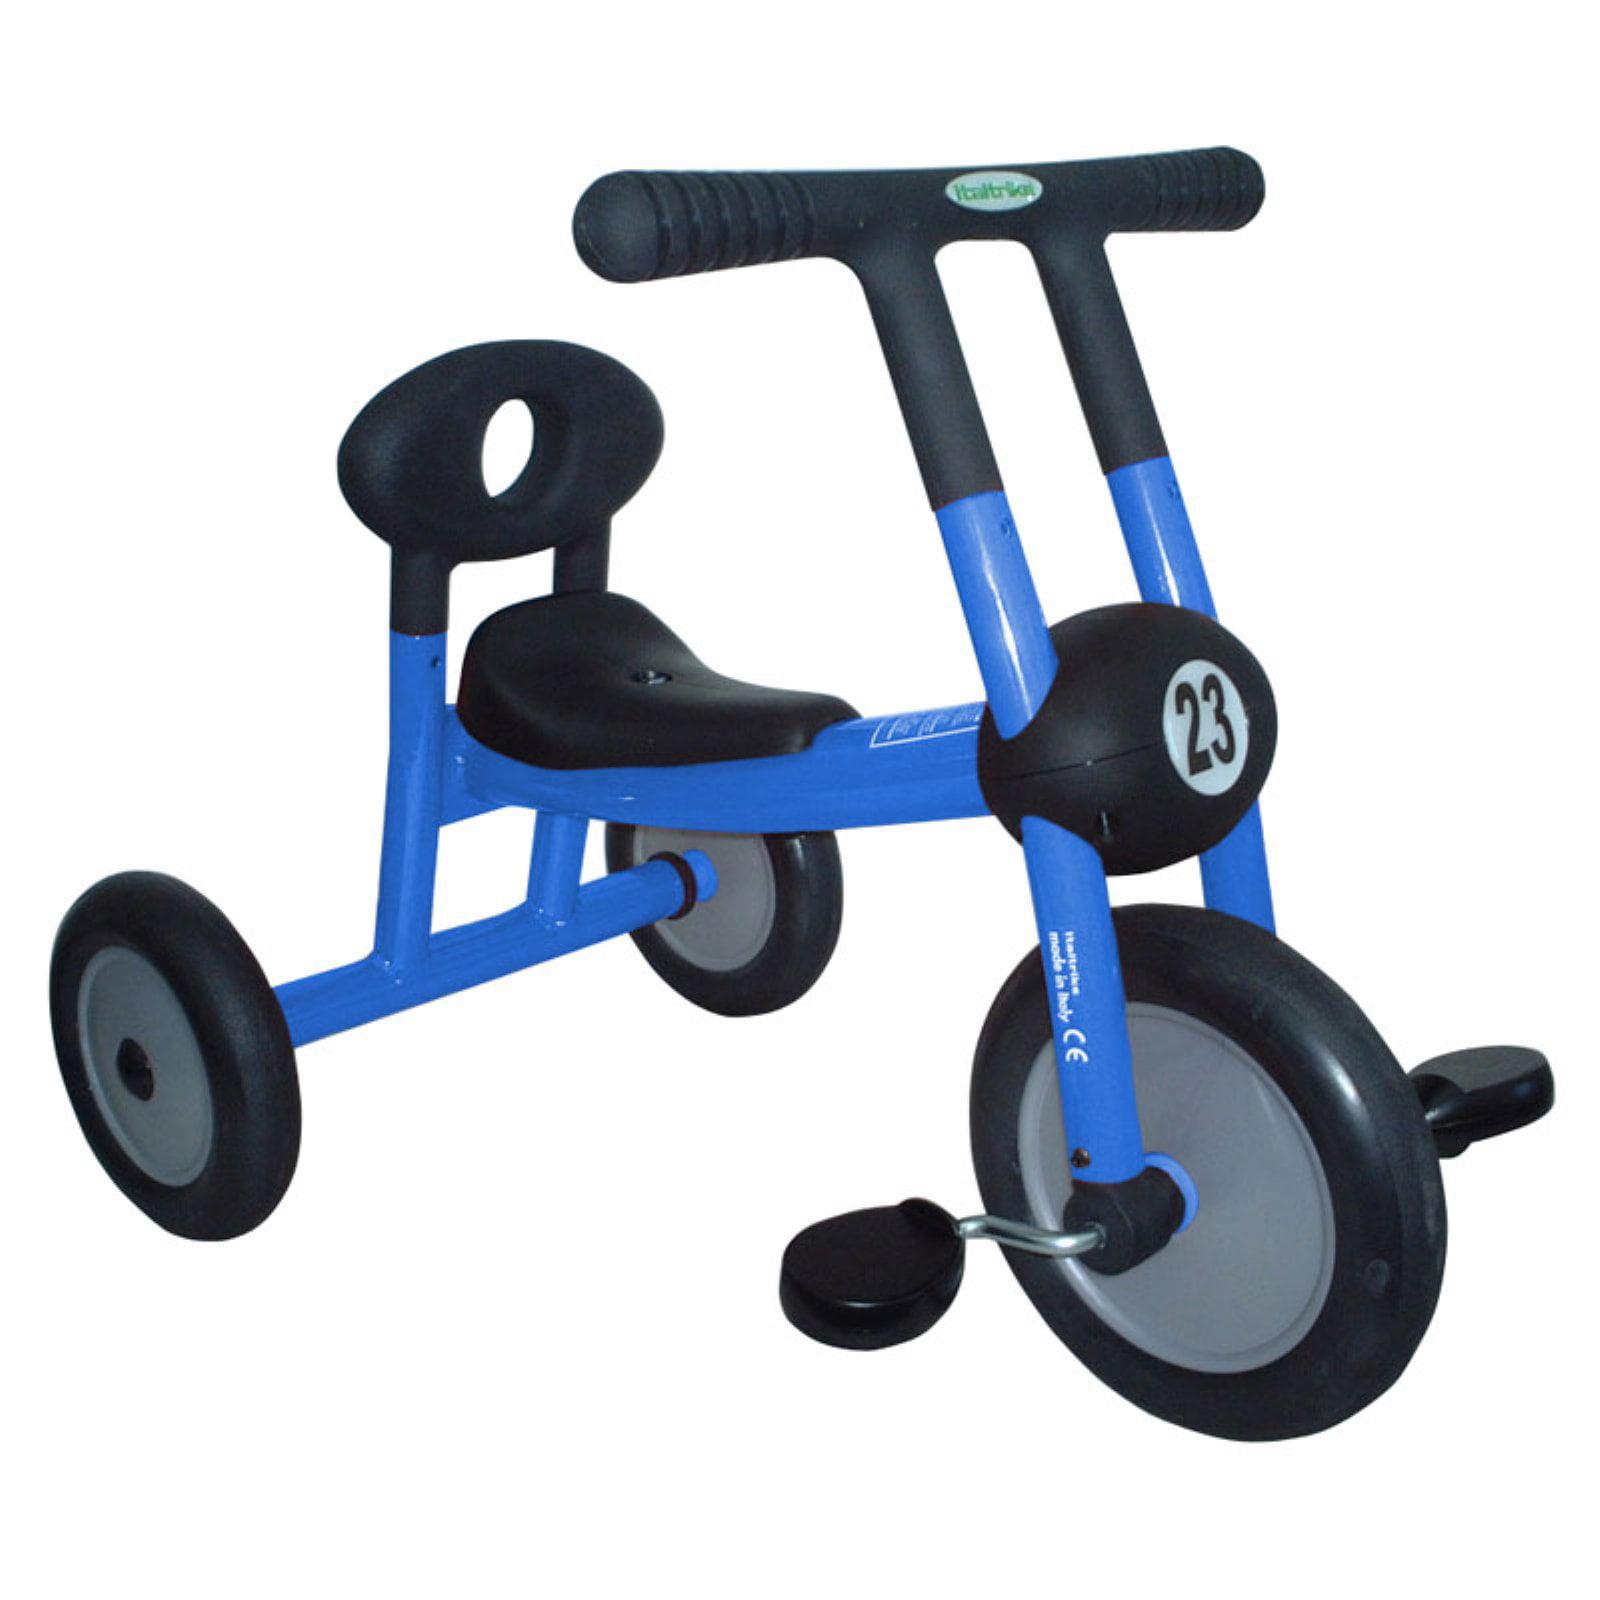 Italtrike Pilot Series 100 Tricycle